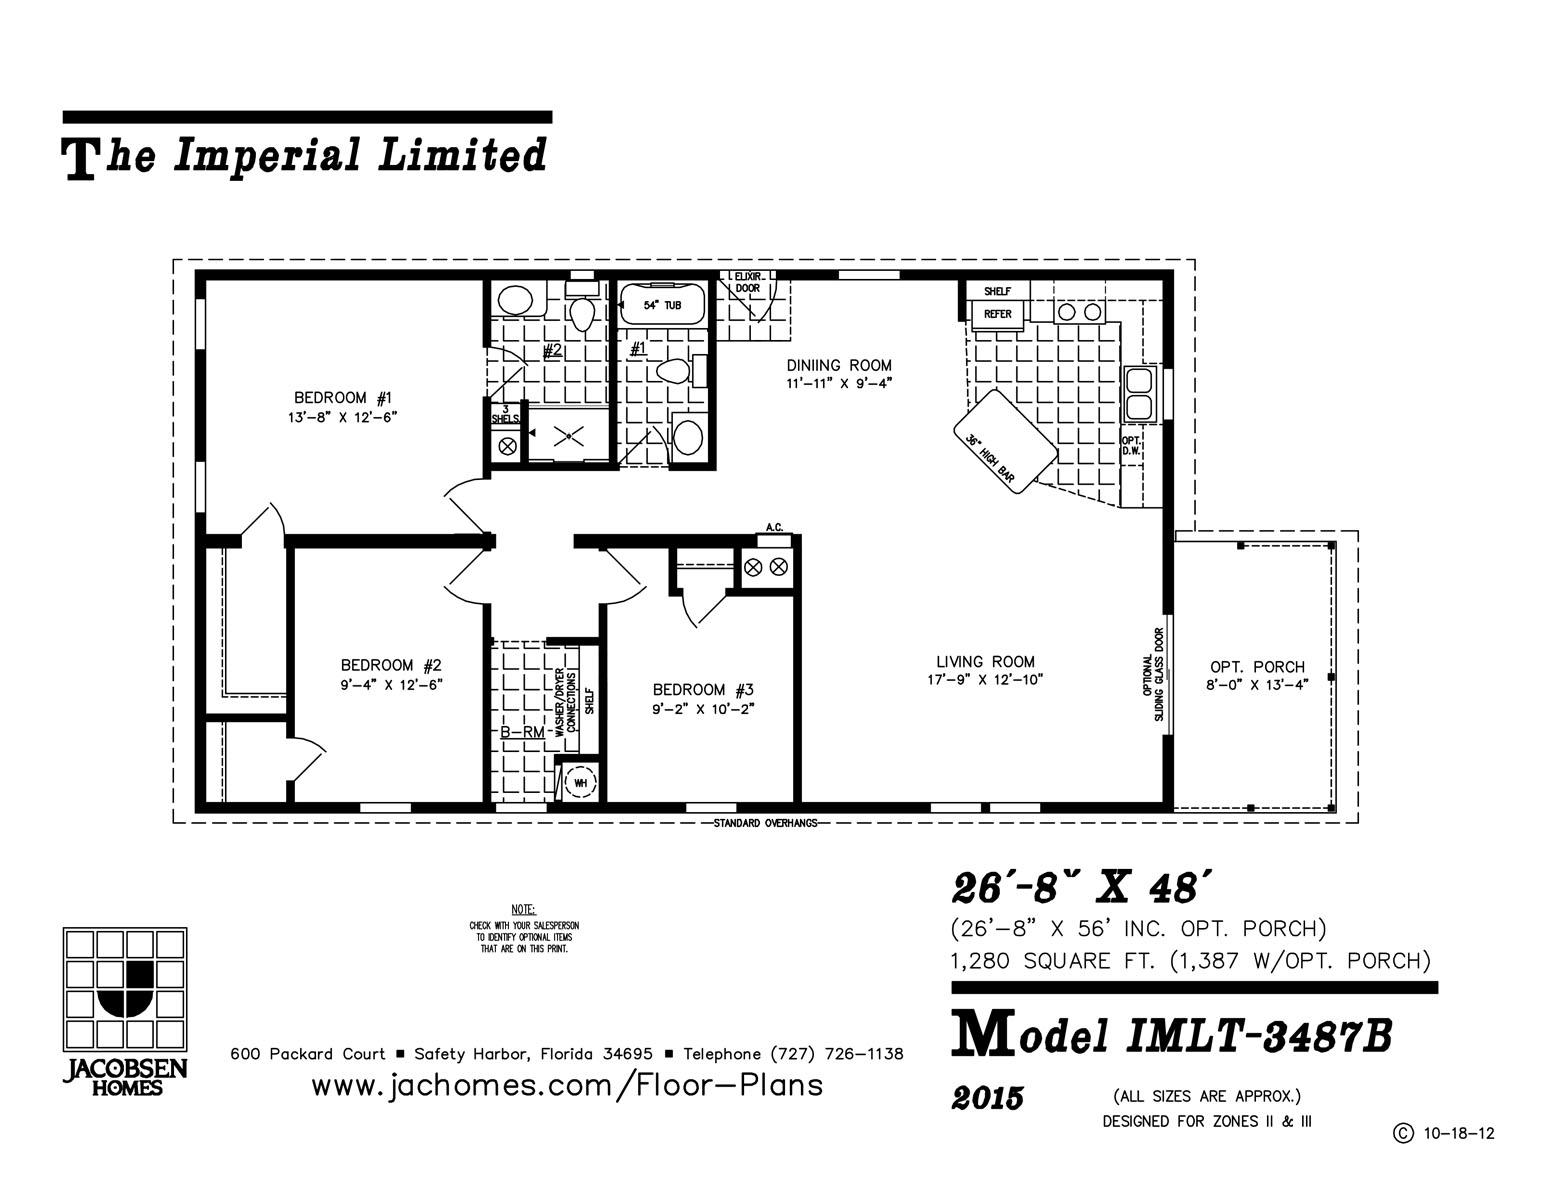 1,280 Sq. Ft. | 2 Bedroom | 2 Bath 26′ X 48′. DOWNLOAD FLOOR PLAN · REQUEST MOBILE  HOME PRICING